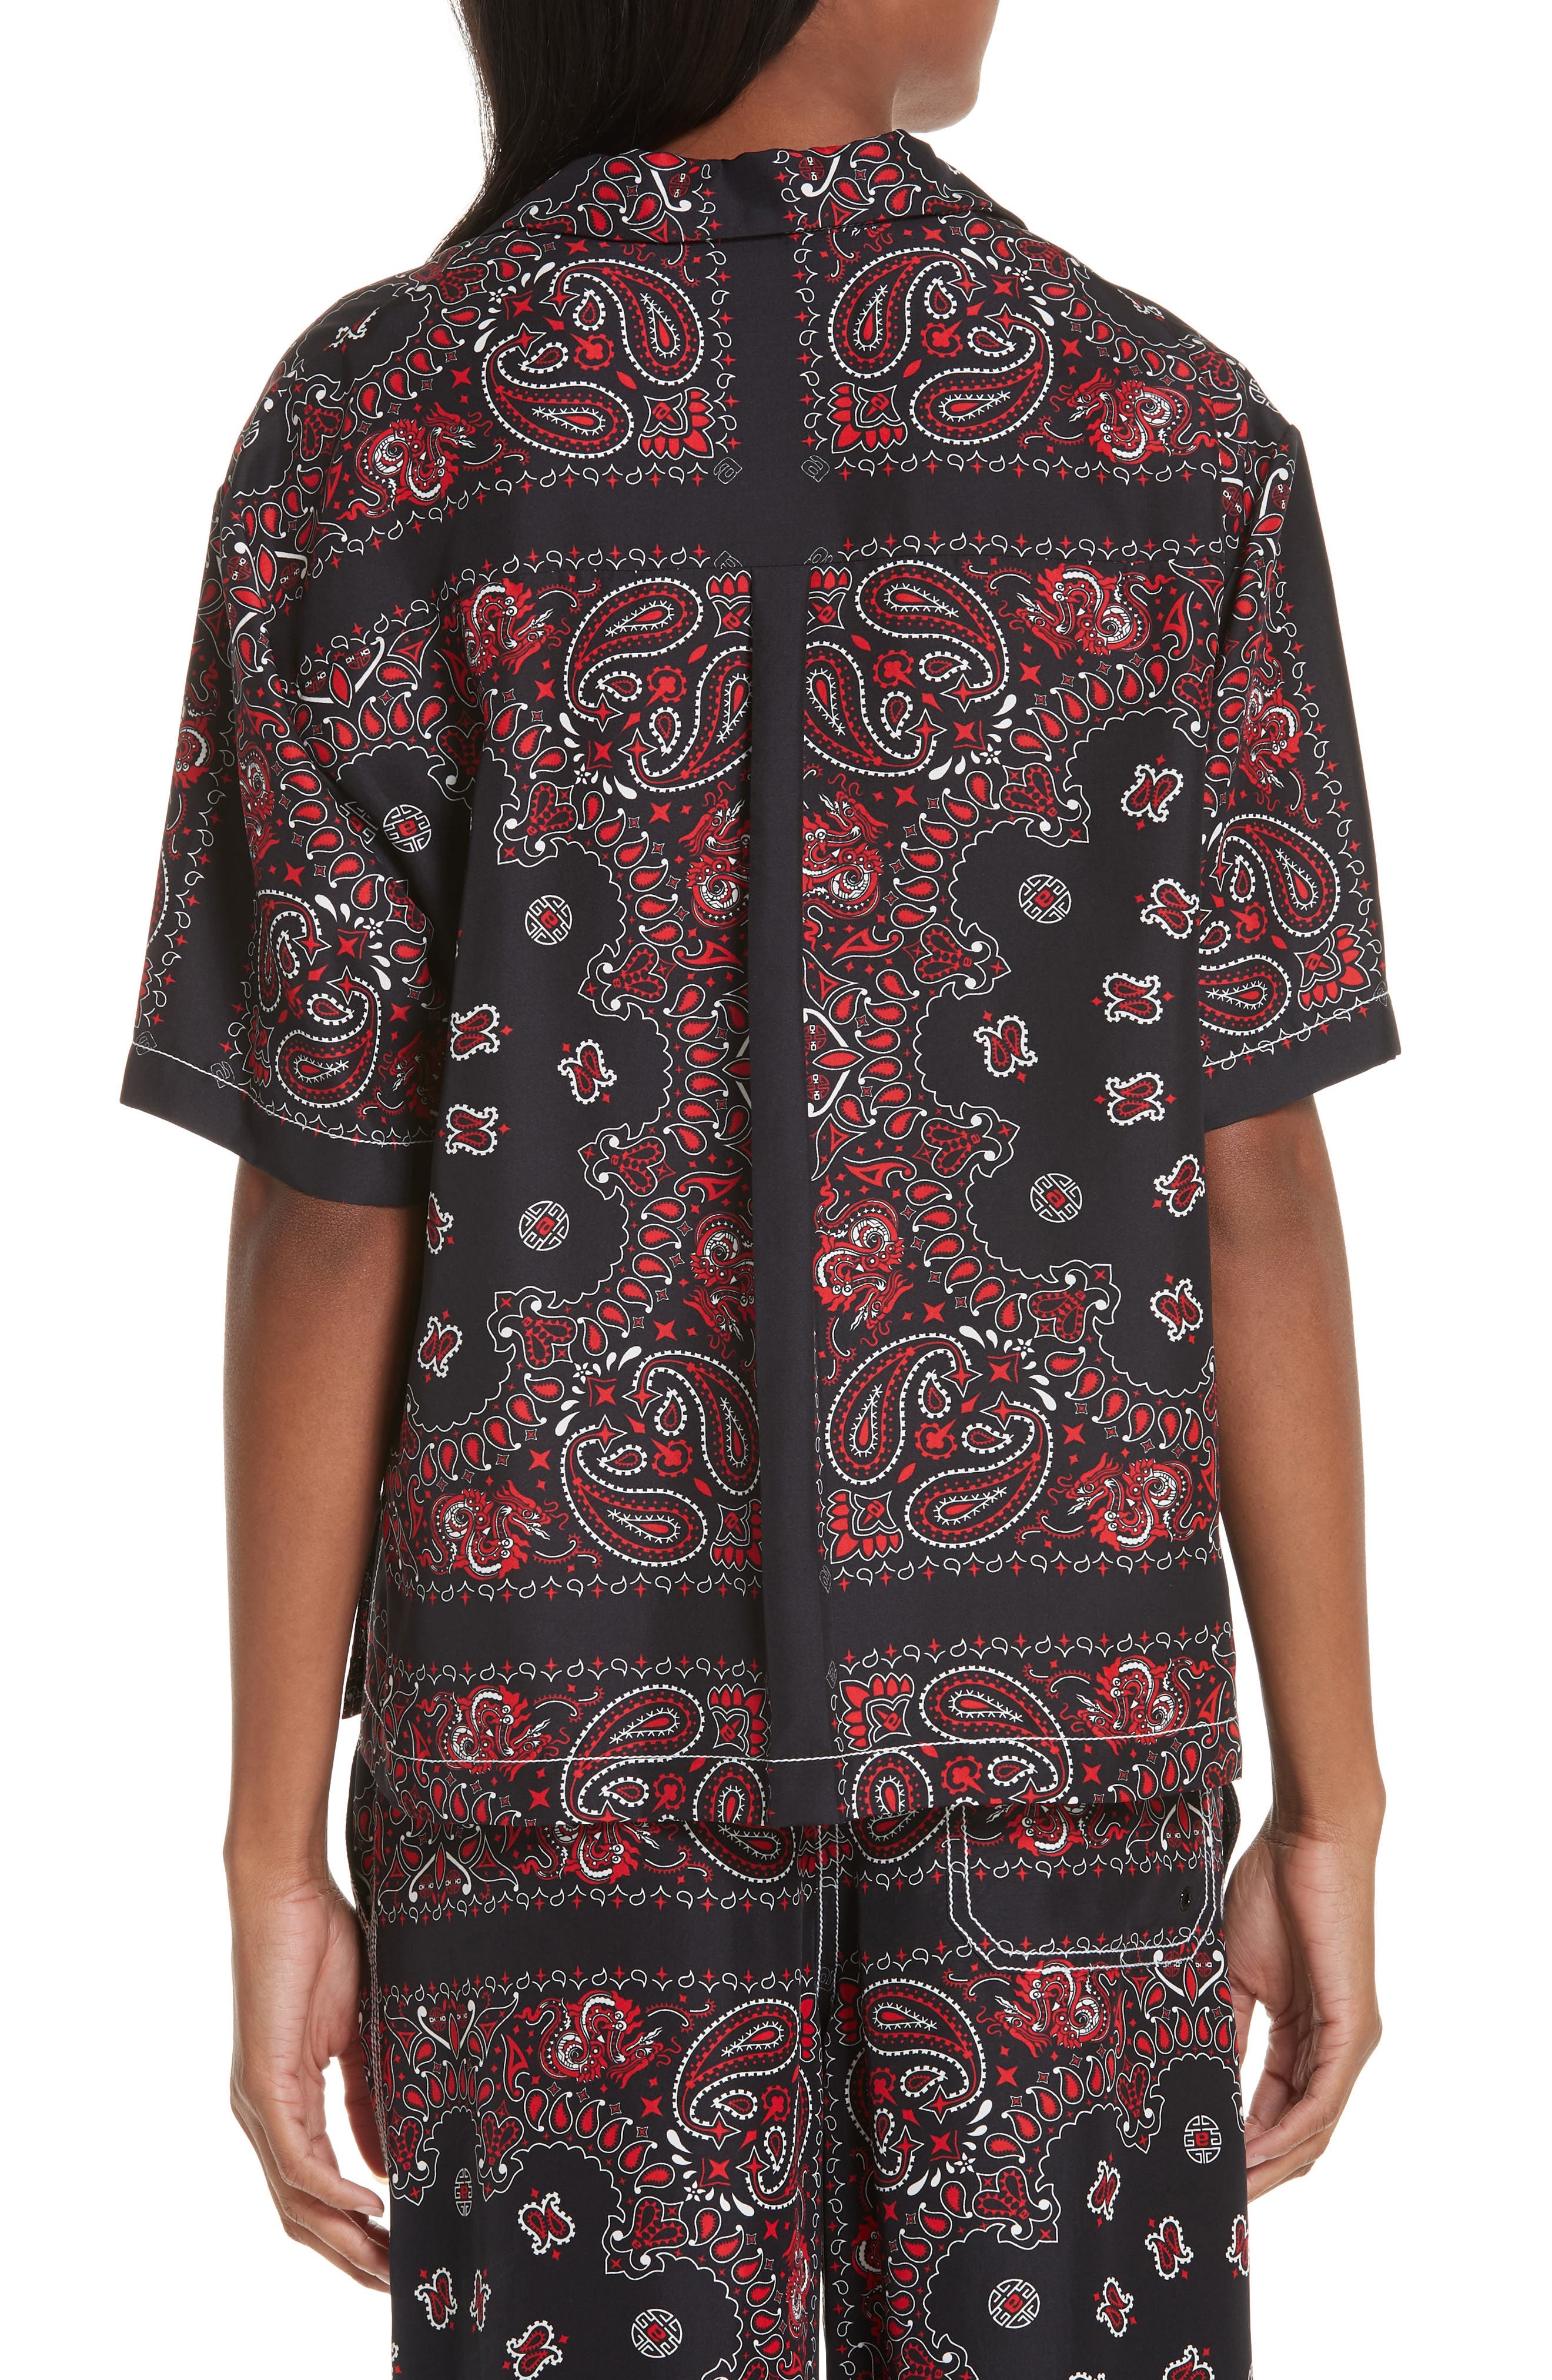 ALEXANDER WANG,                             Bandana Print Silk Shirt,                             Alternate thumbnail 2, color,                             BLACK/ RED